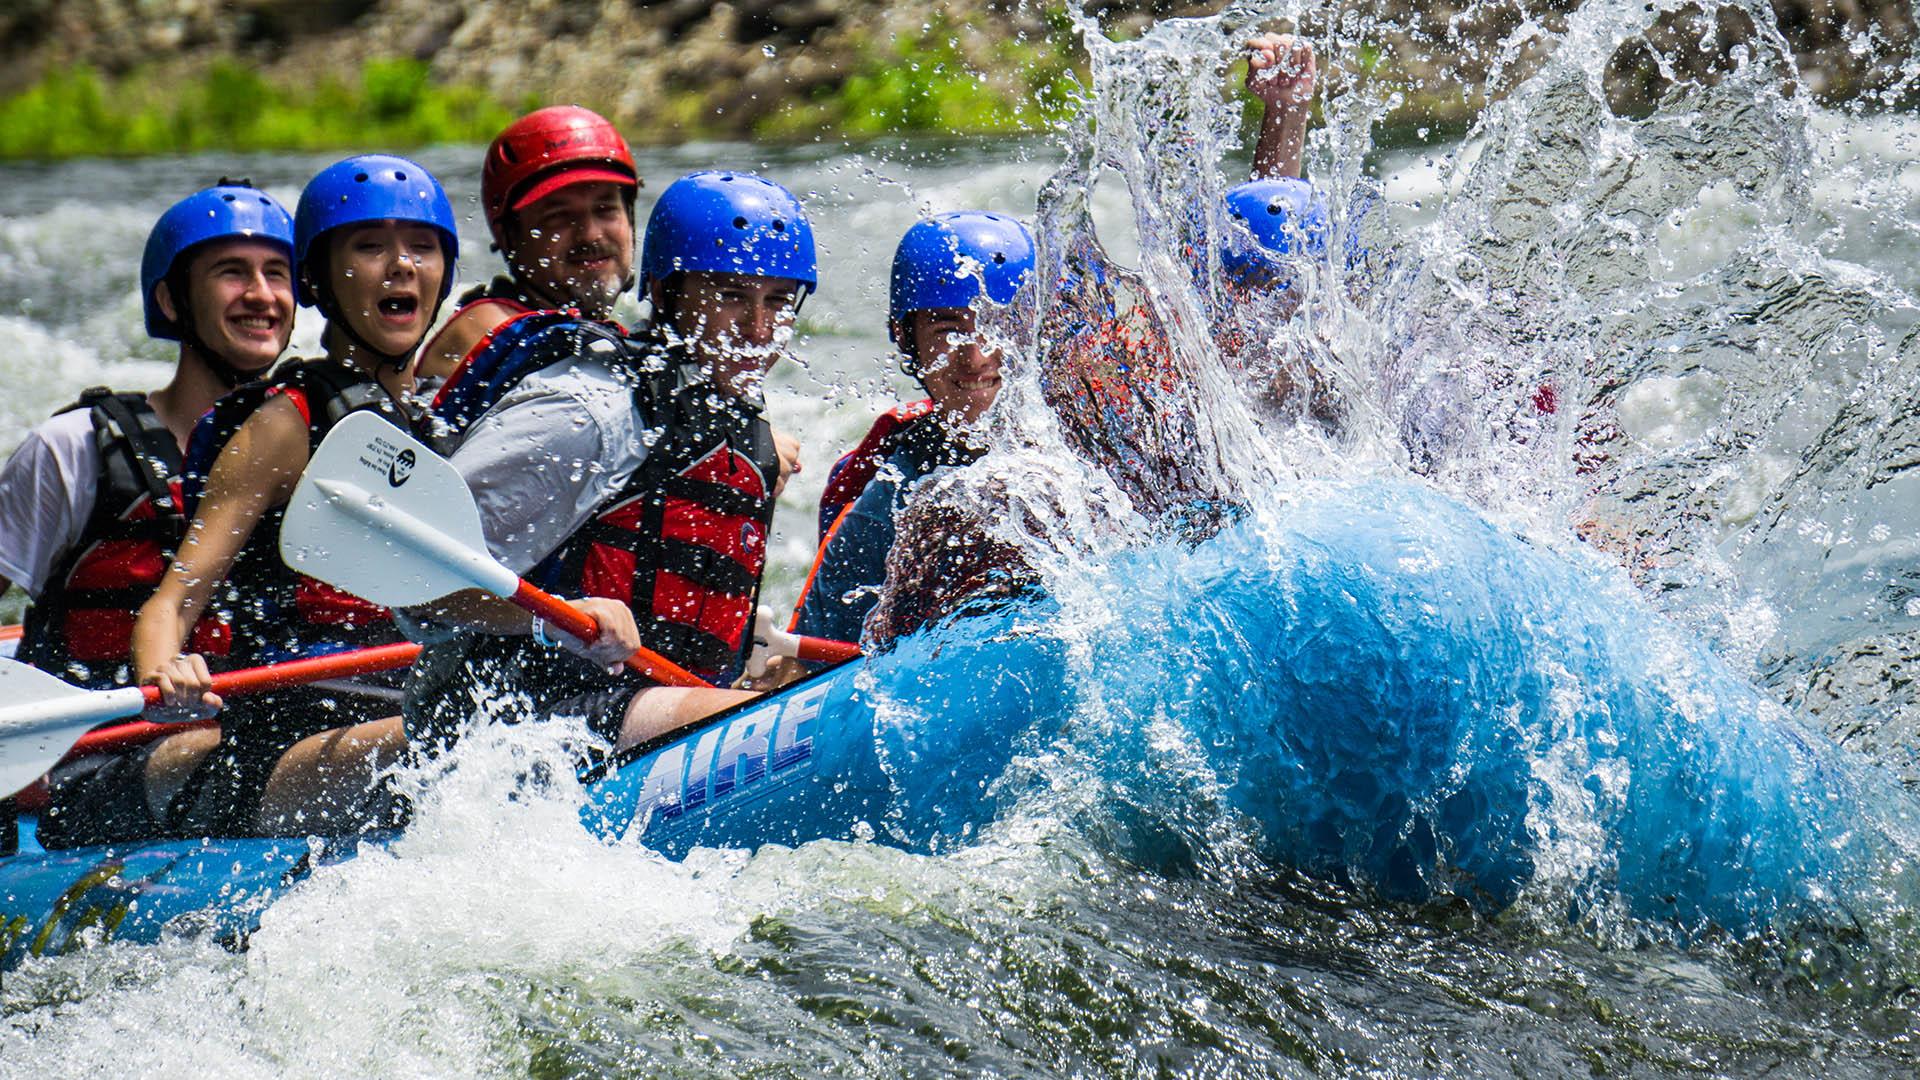 Ocoee Inn Whitewater Rafting Splash